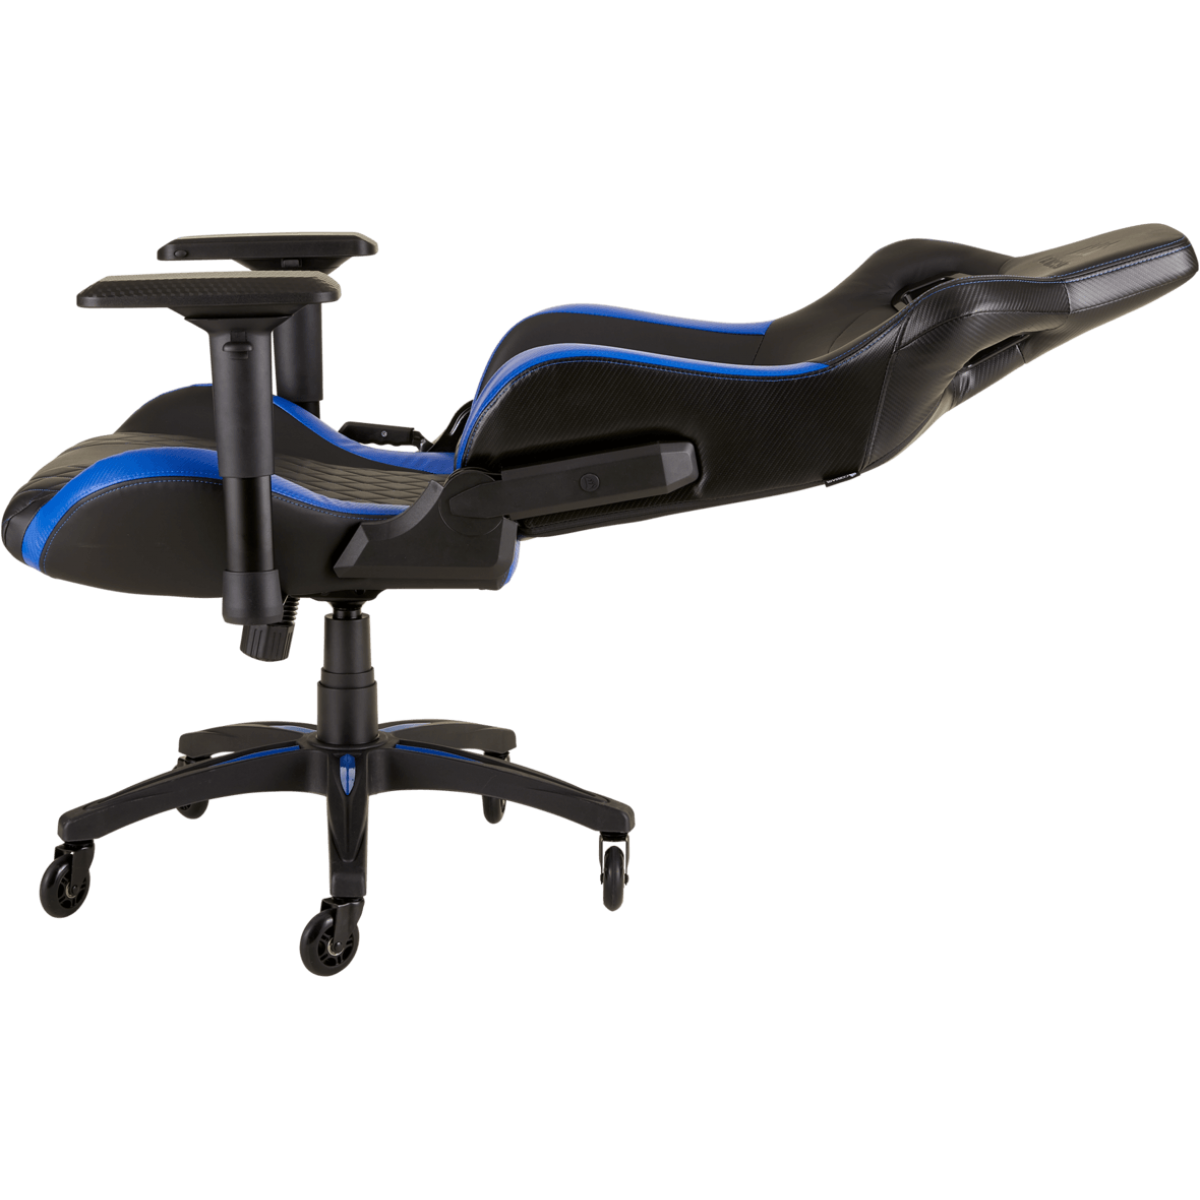 Cadeira Gamer Corsair T1 Race 2018 Edition, Black-Blue, CF-9010014-WW